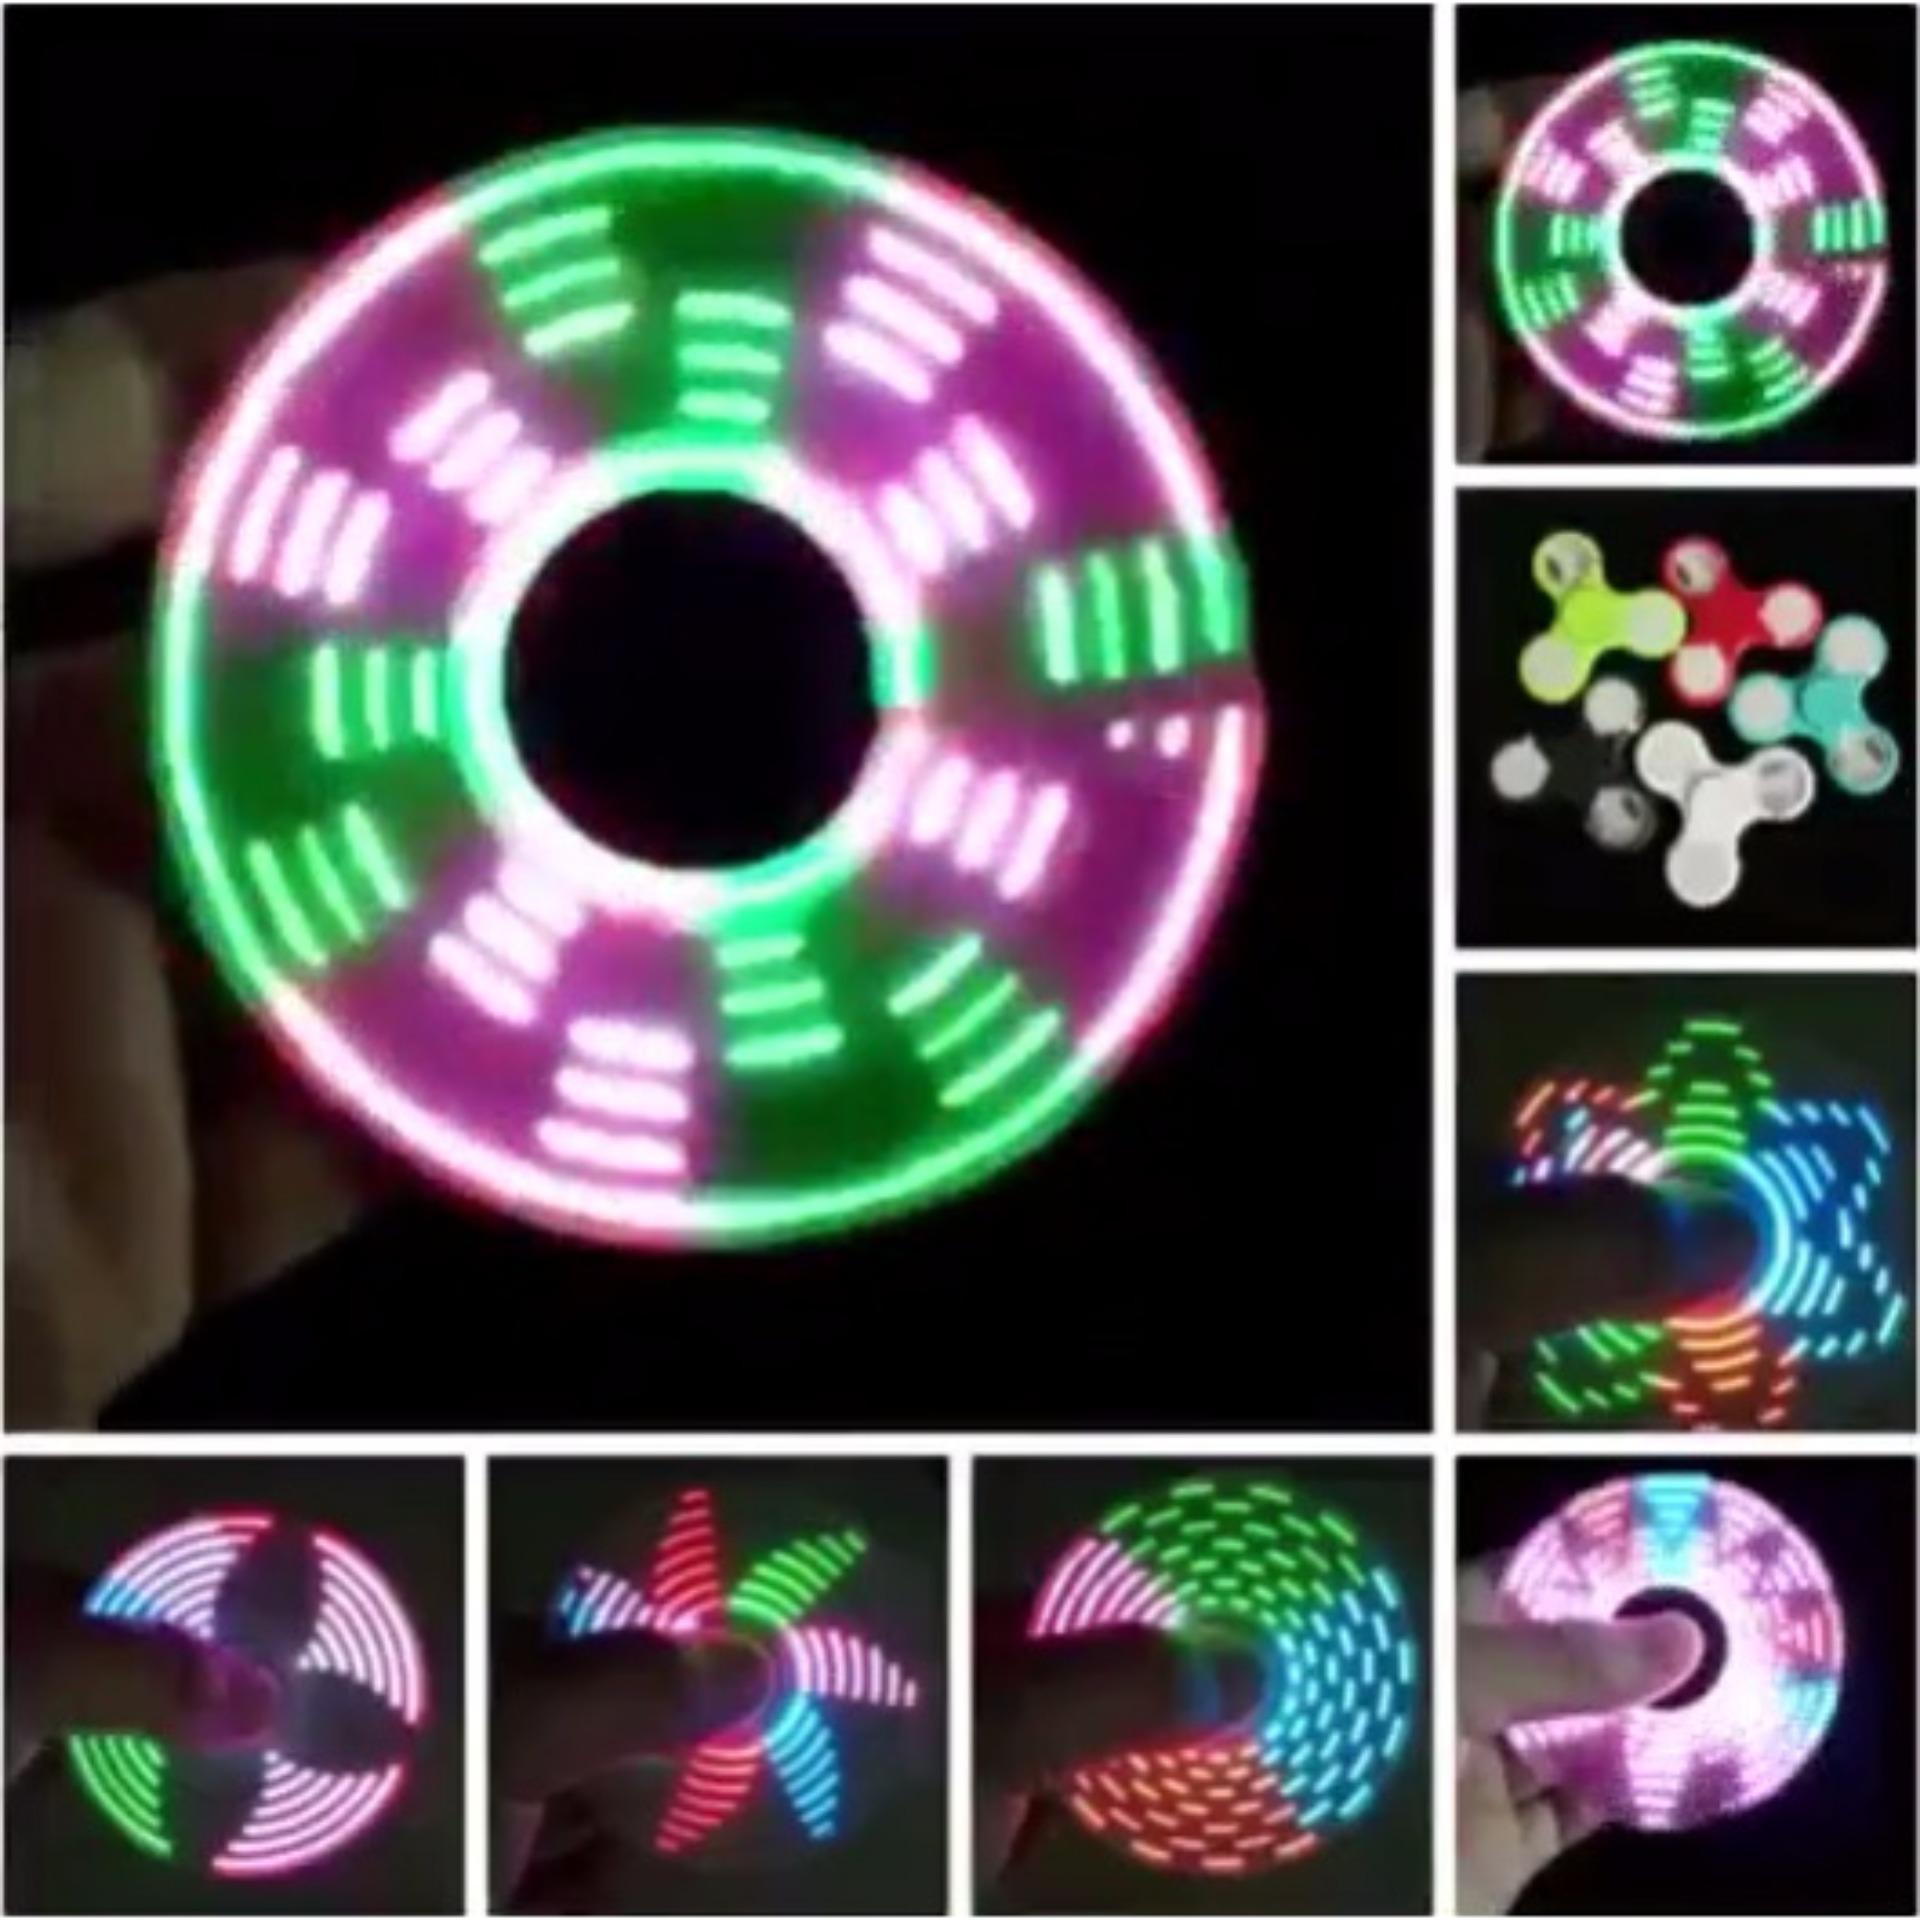 Lucky - LED Glow Nyala Gambar Warna Warni Fidget Spinner Hand Spinner Toys Focus Games Mainan